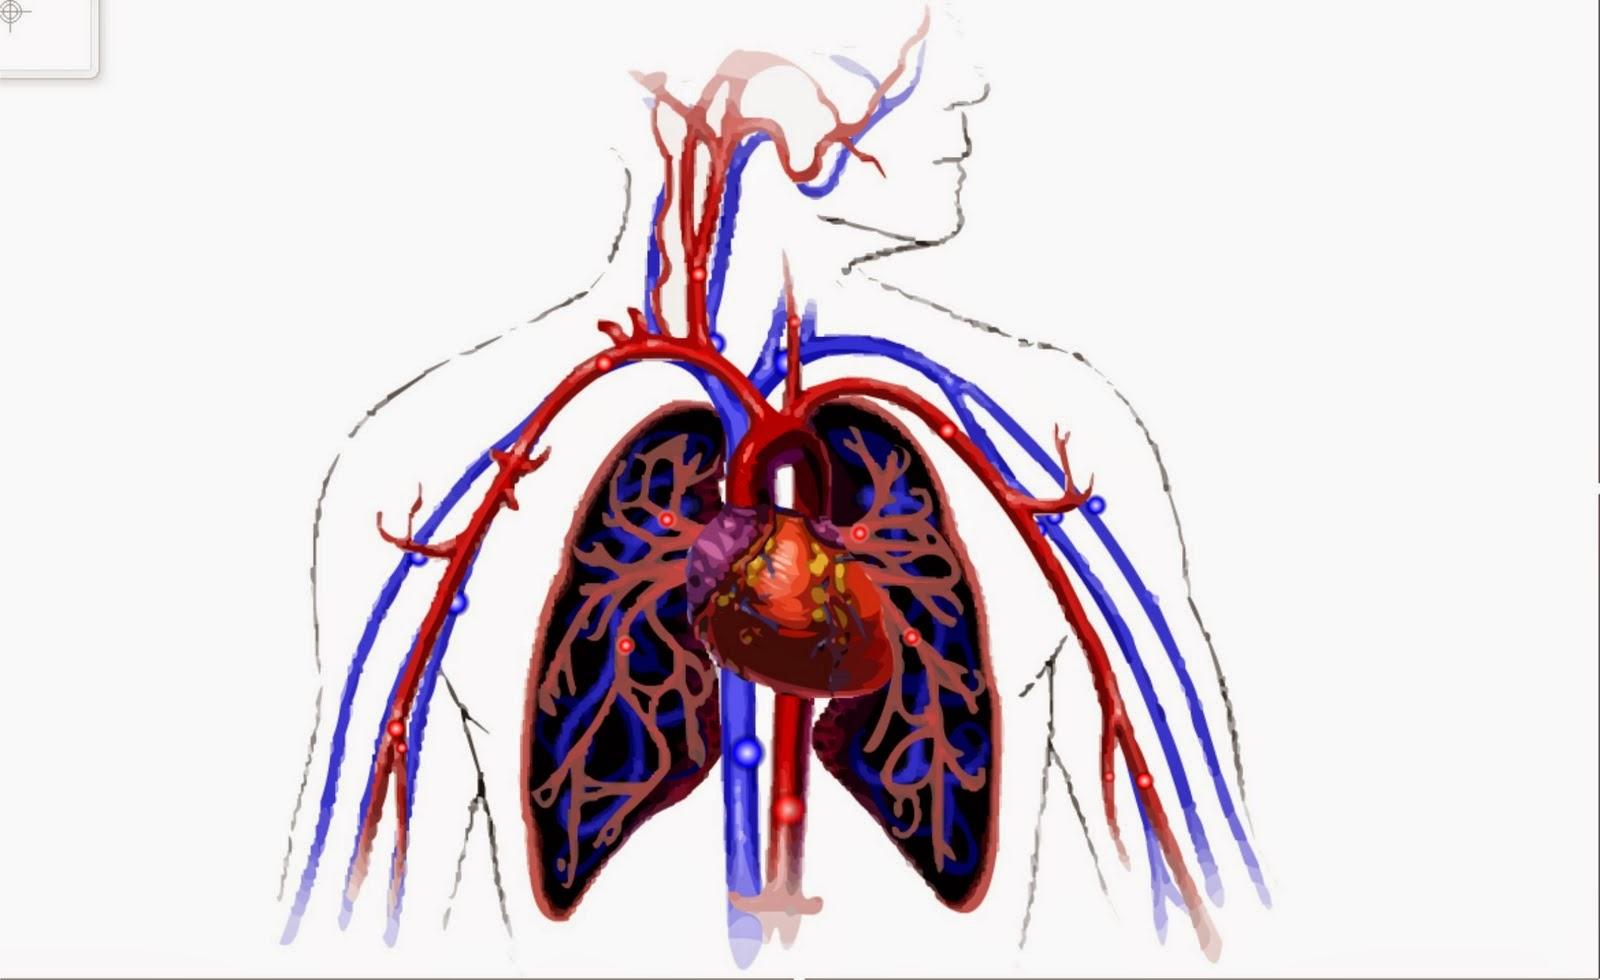 BIOLOGY EDUCATION: 11 Fakta Menarik tentang Peredaran Darah